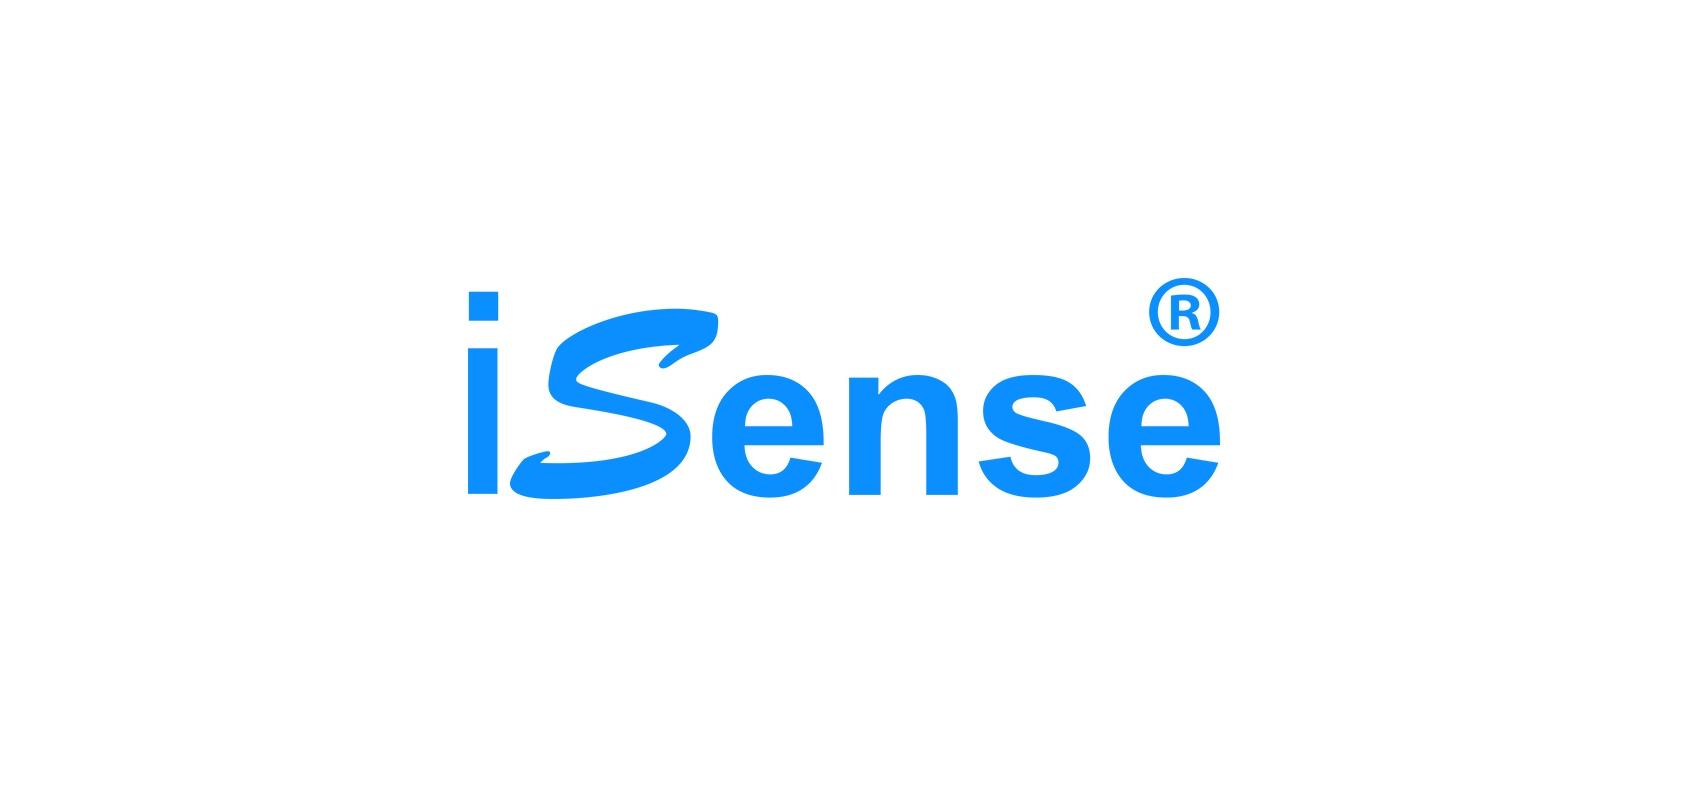 isense是什么牌子_isense品牌怎么样?